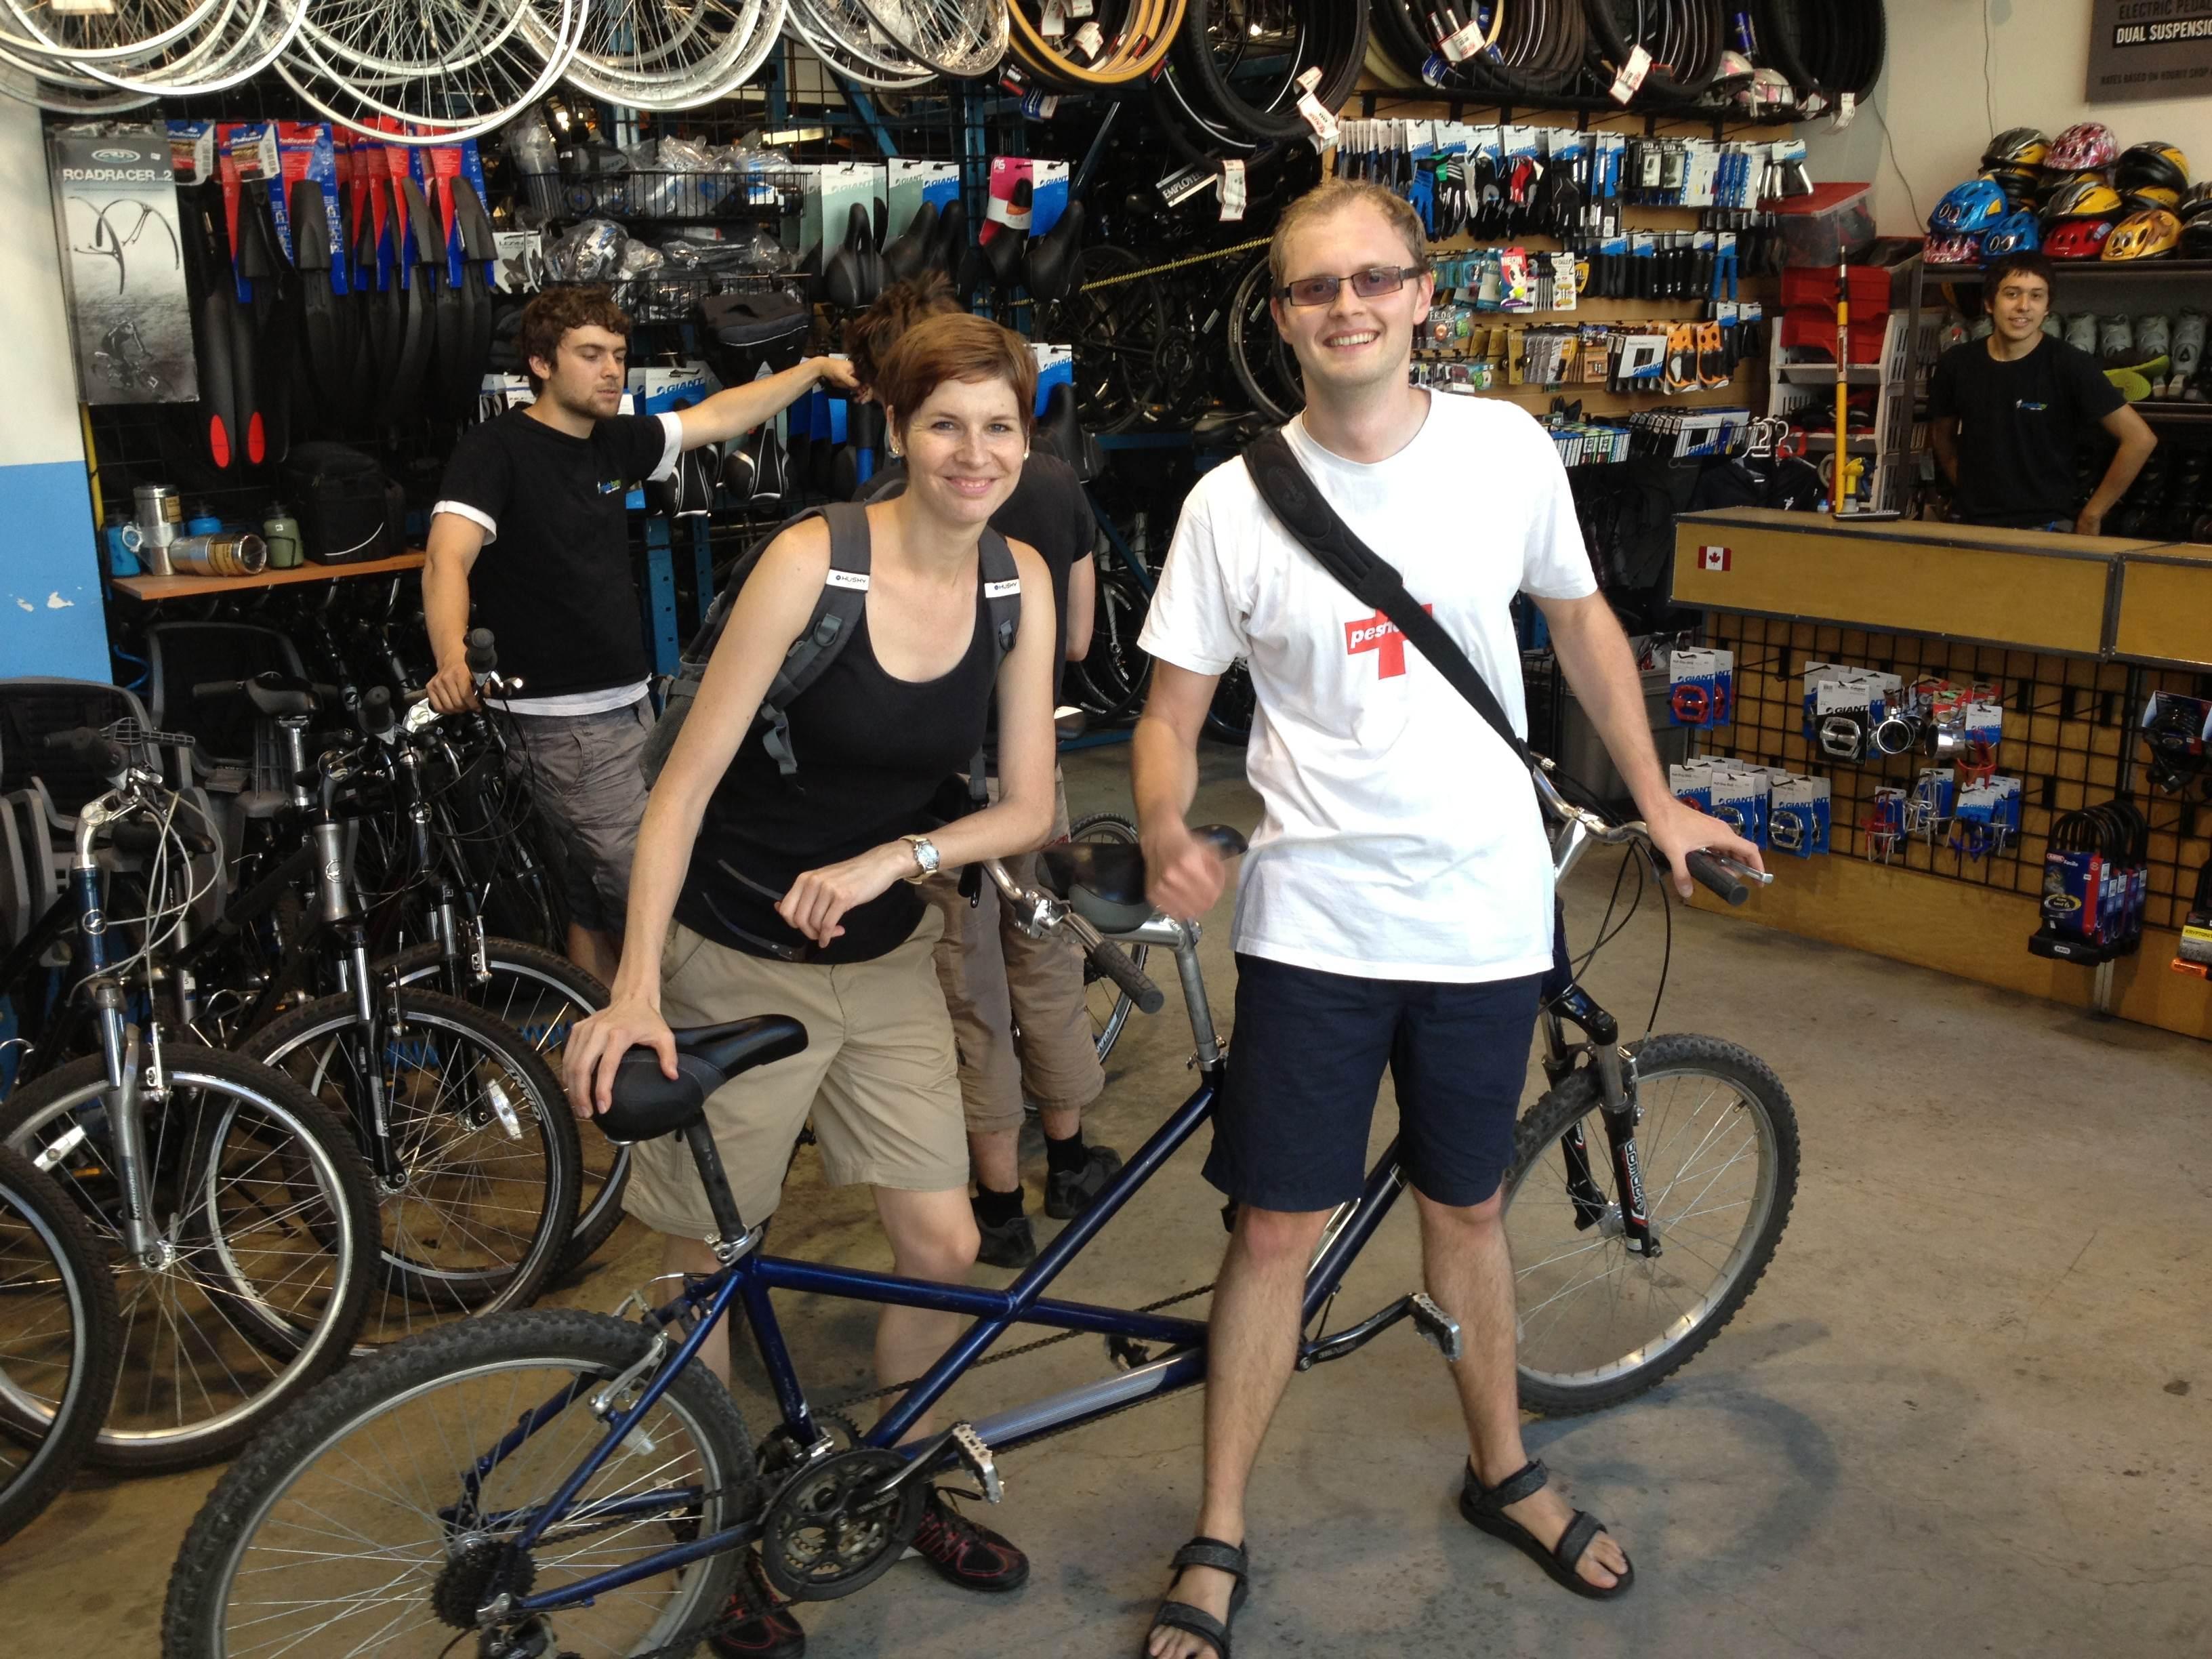 Půjčili jsme si tandem bike